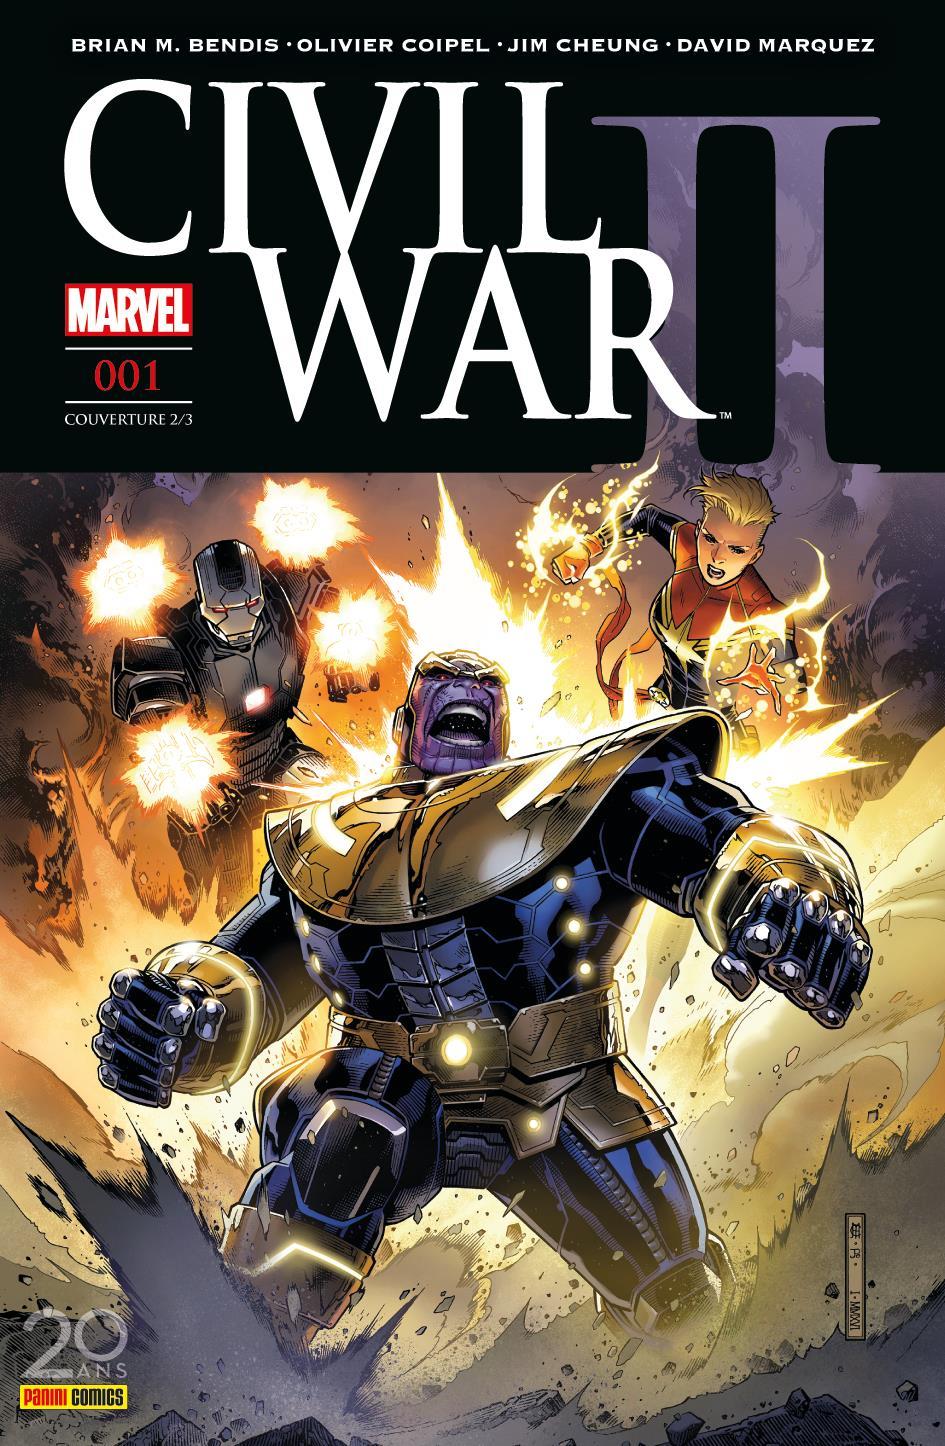 CIVIL WAR II 1 (Couv 2/3)